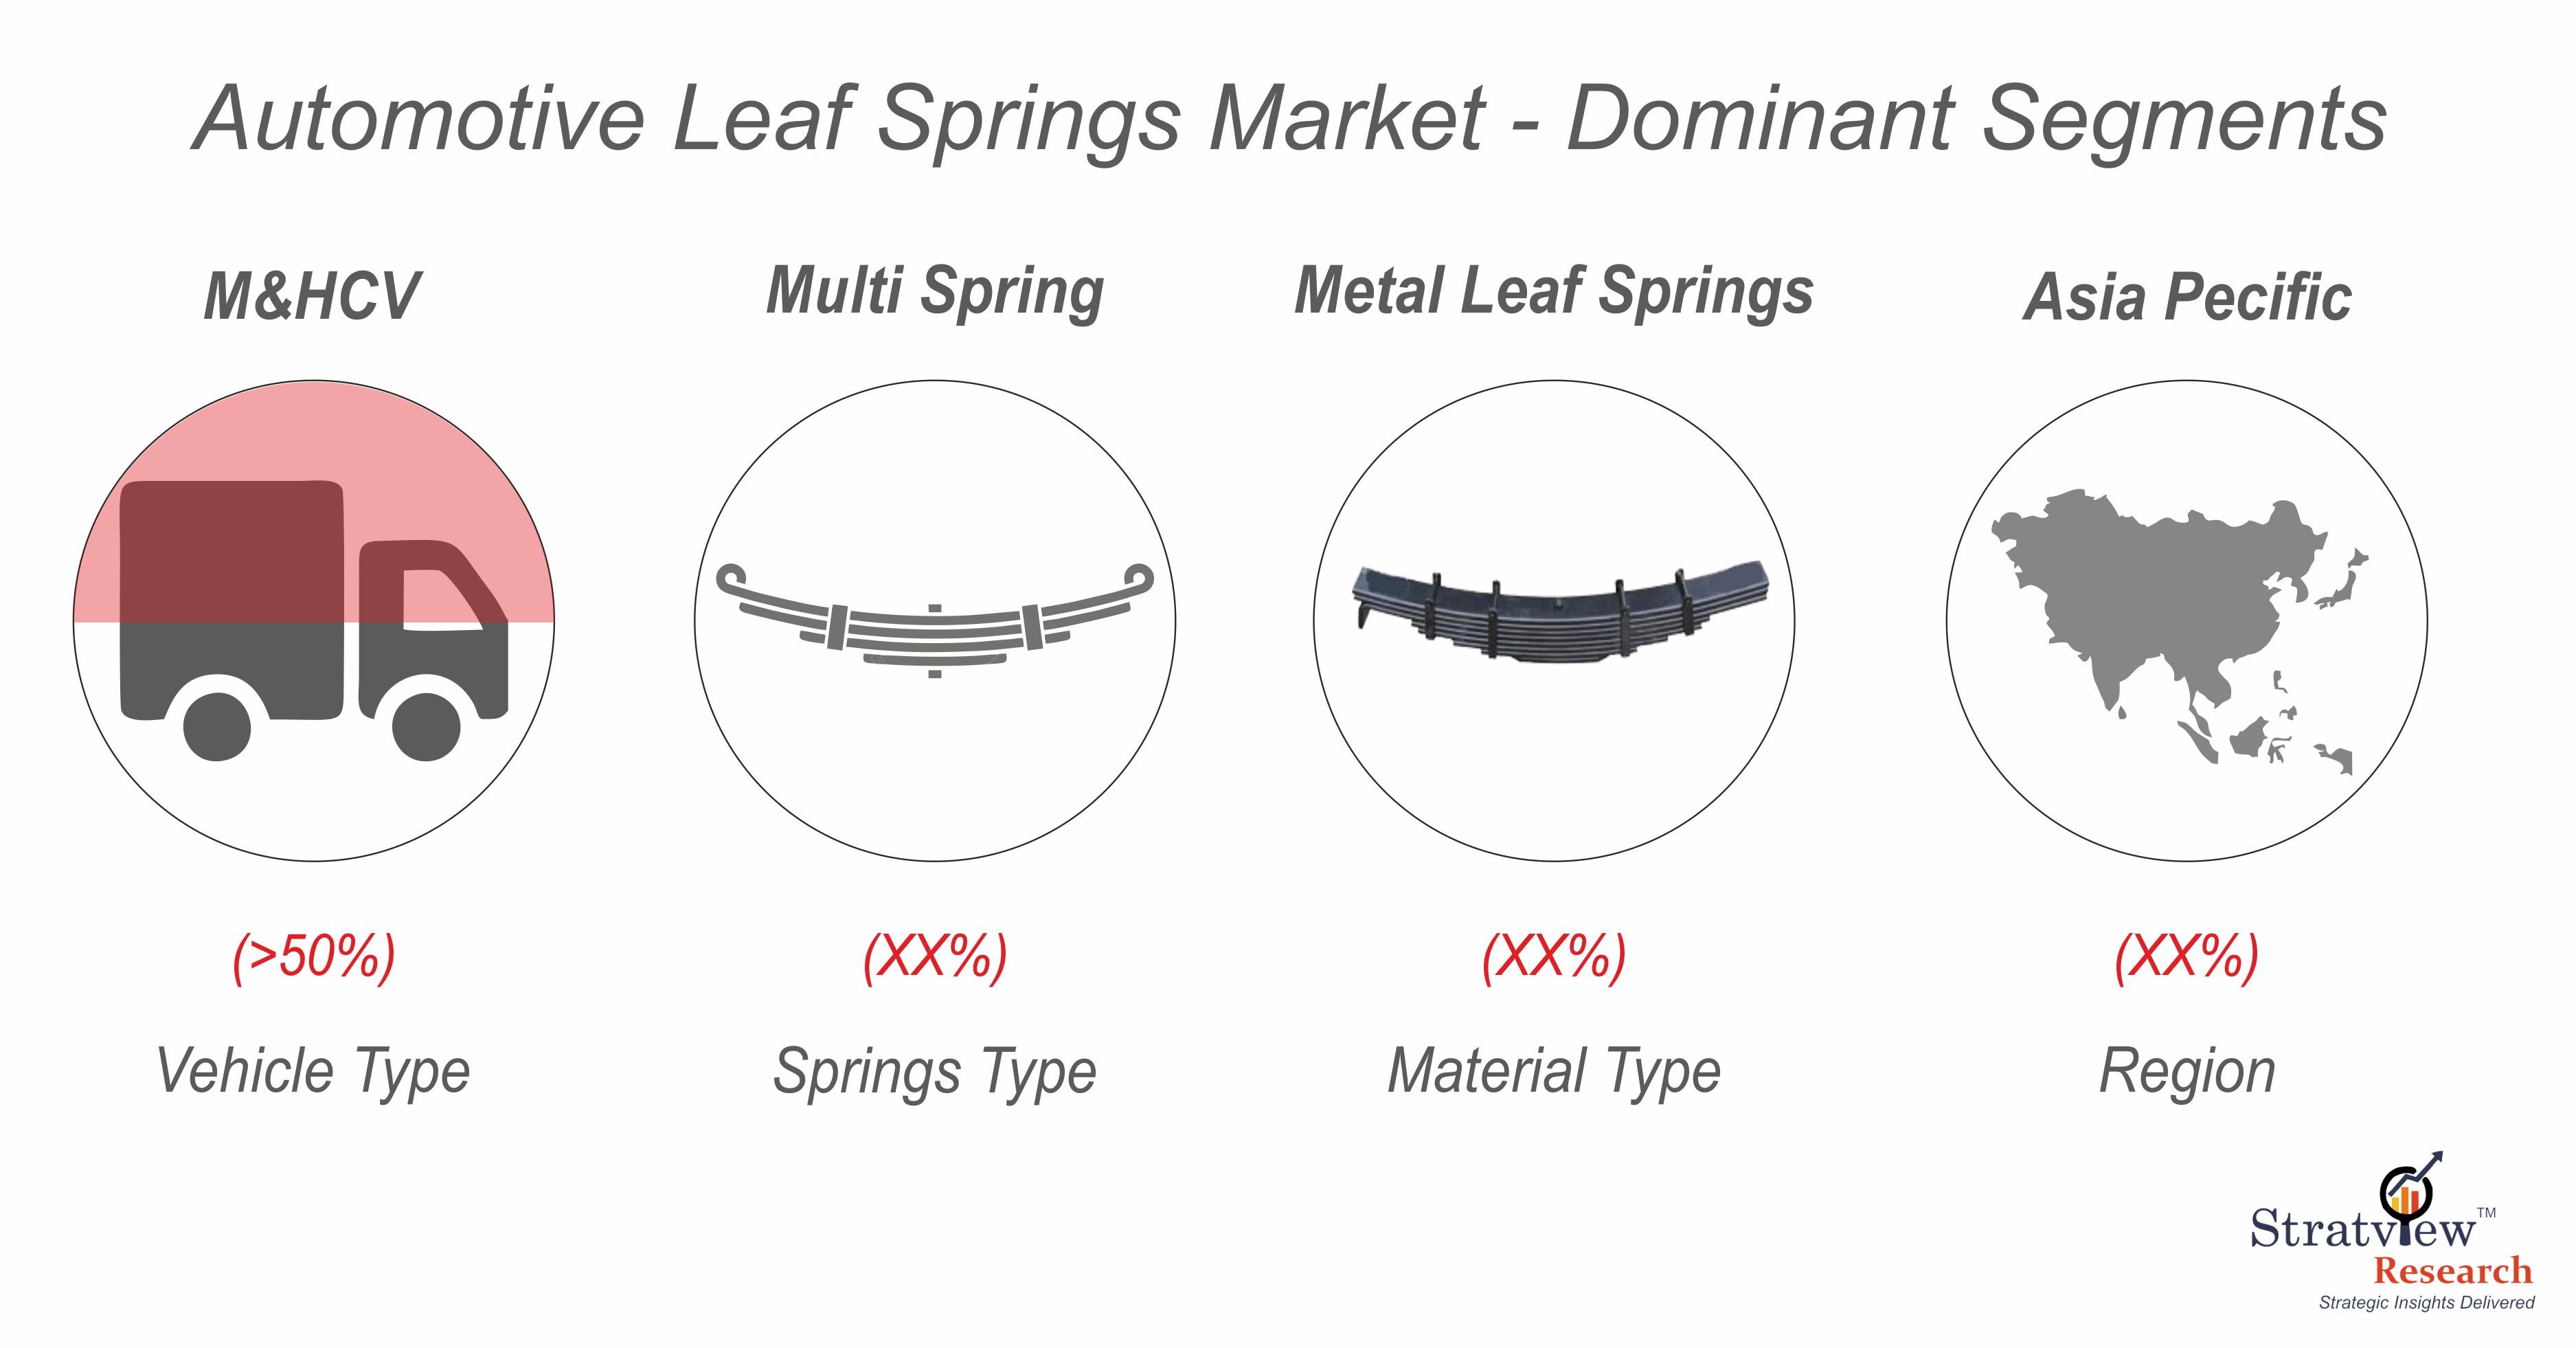 Automotive Leaf Spring Market Segmentation.jpg